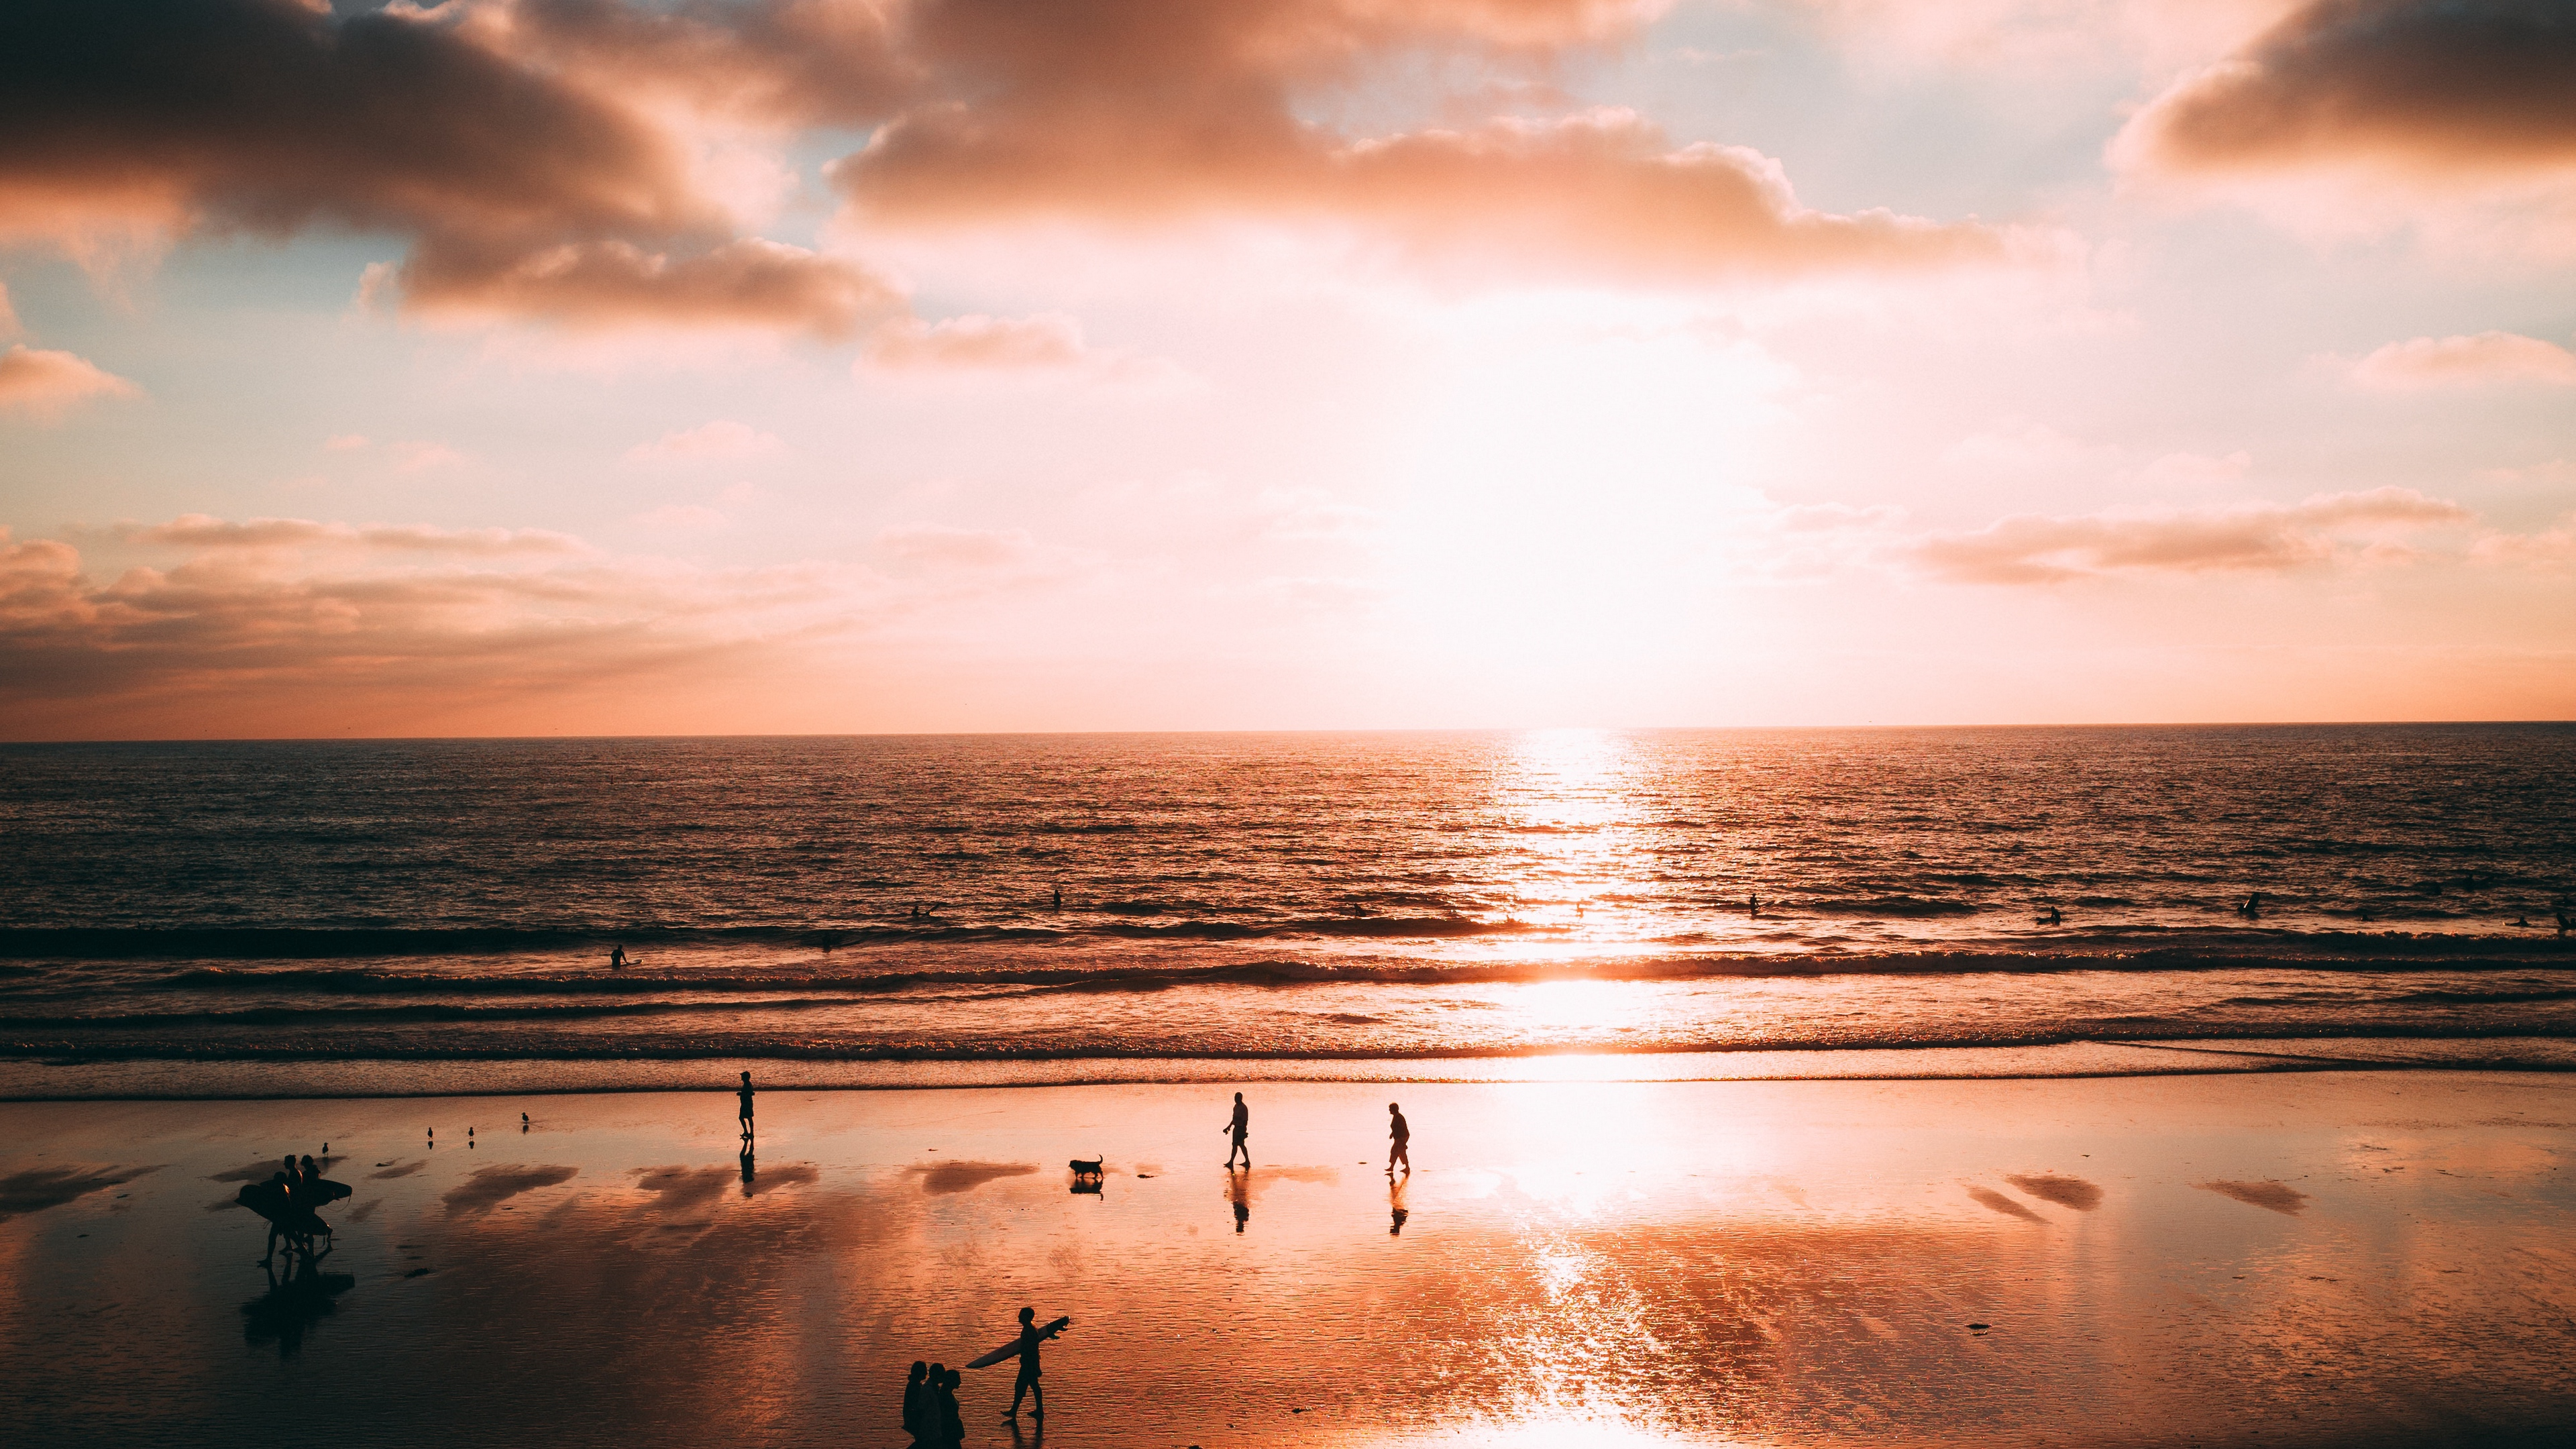 ocean sunset shore la jolla san diego california united states 4k 1541117205 - ocean, sunset, shore, la jolla, san diego, california, united states 4k - sunset, Shore, Ocean